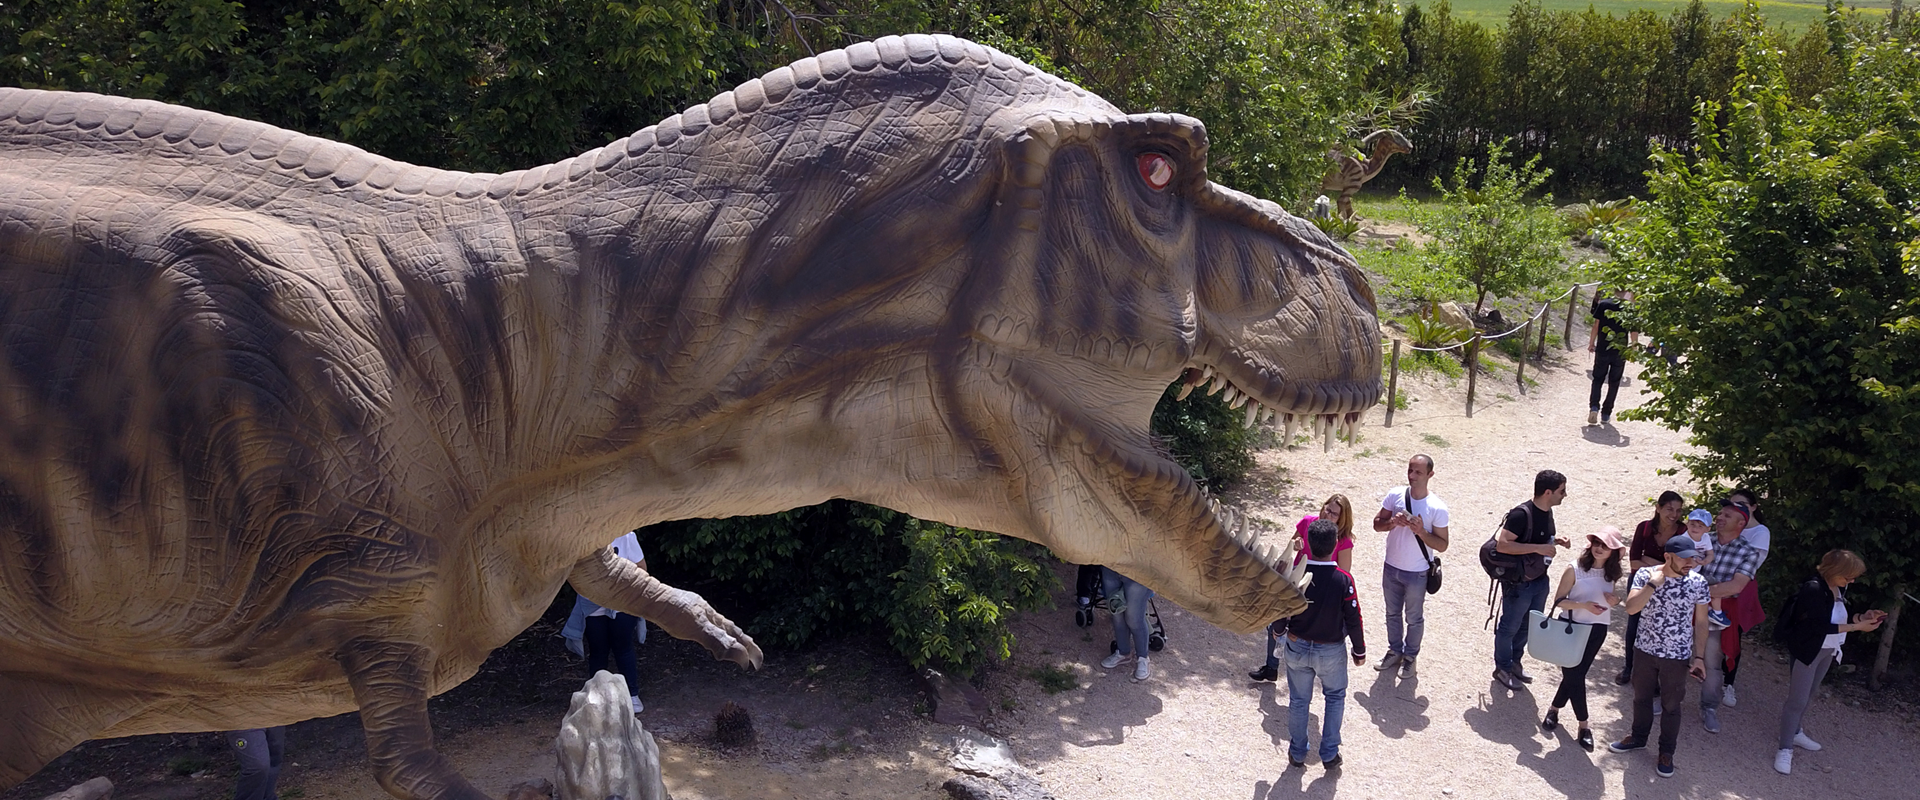 T-Rex Parco Sardegna in miniatura